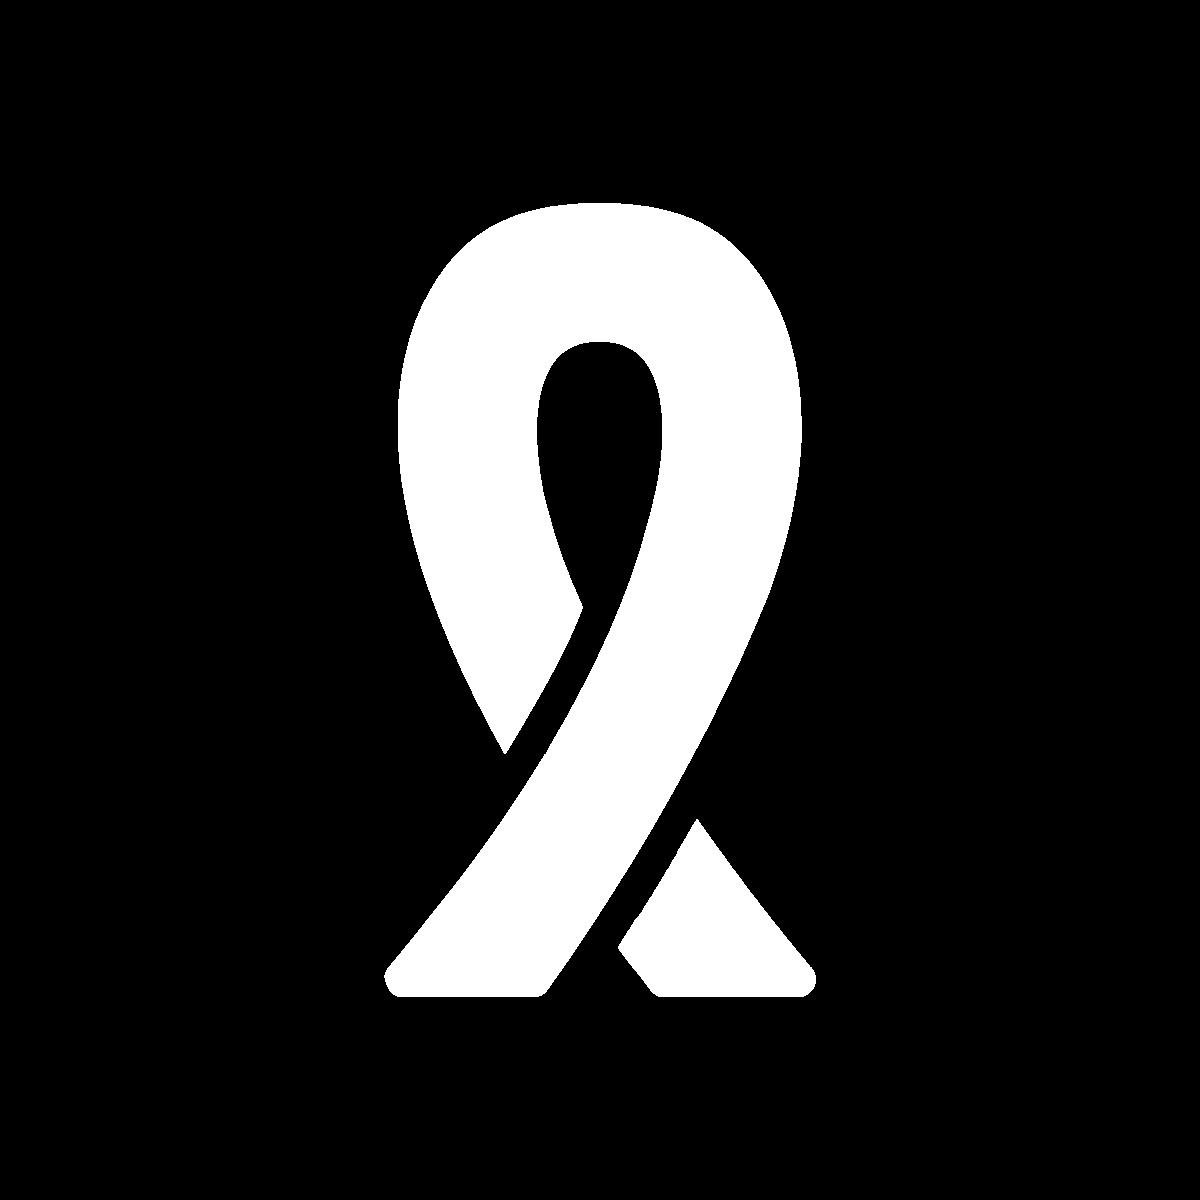 about osteosarcoma icon